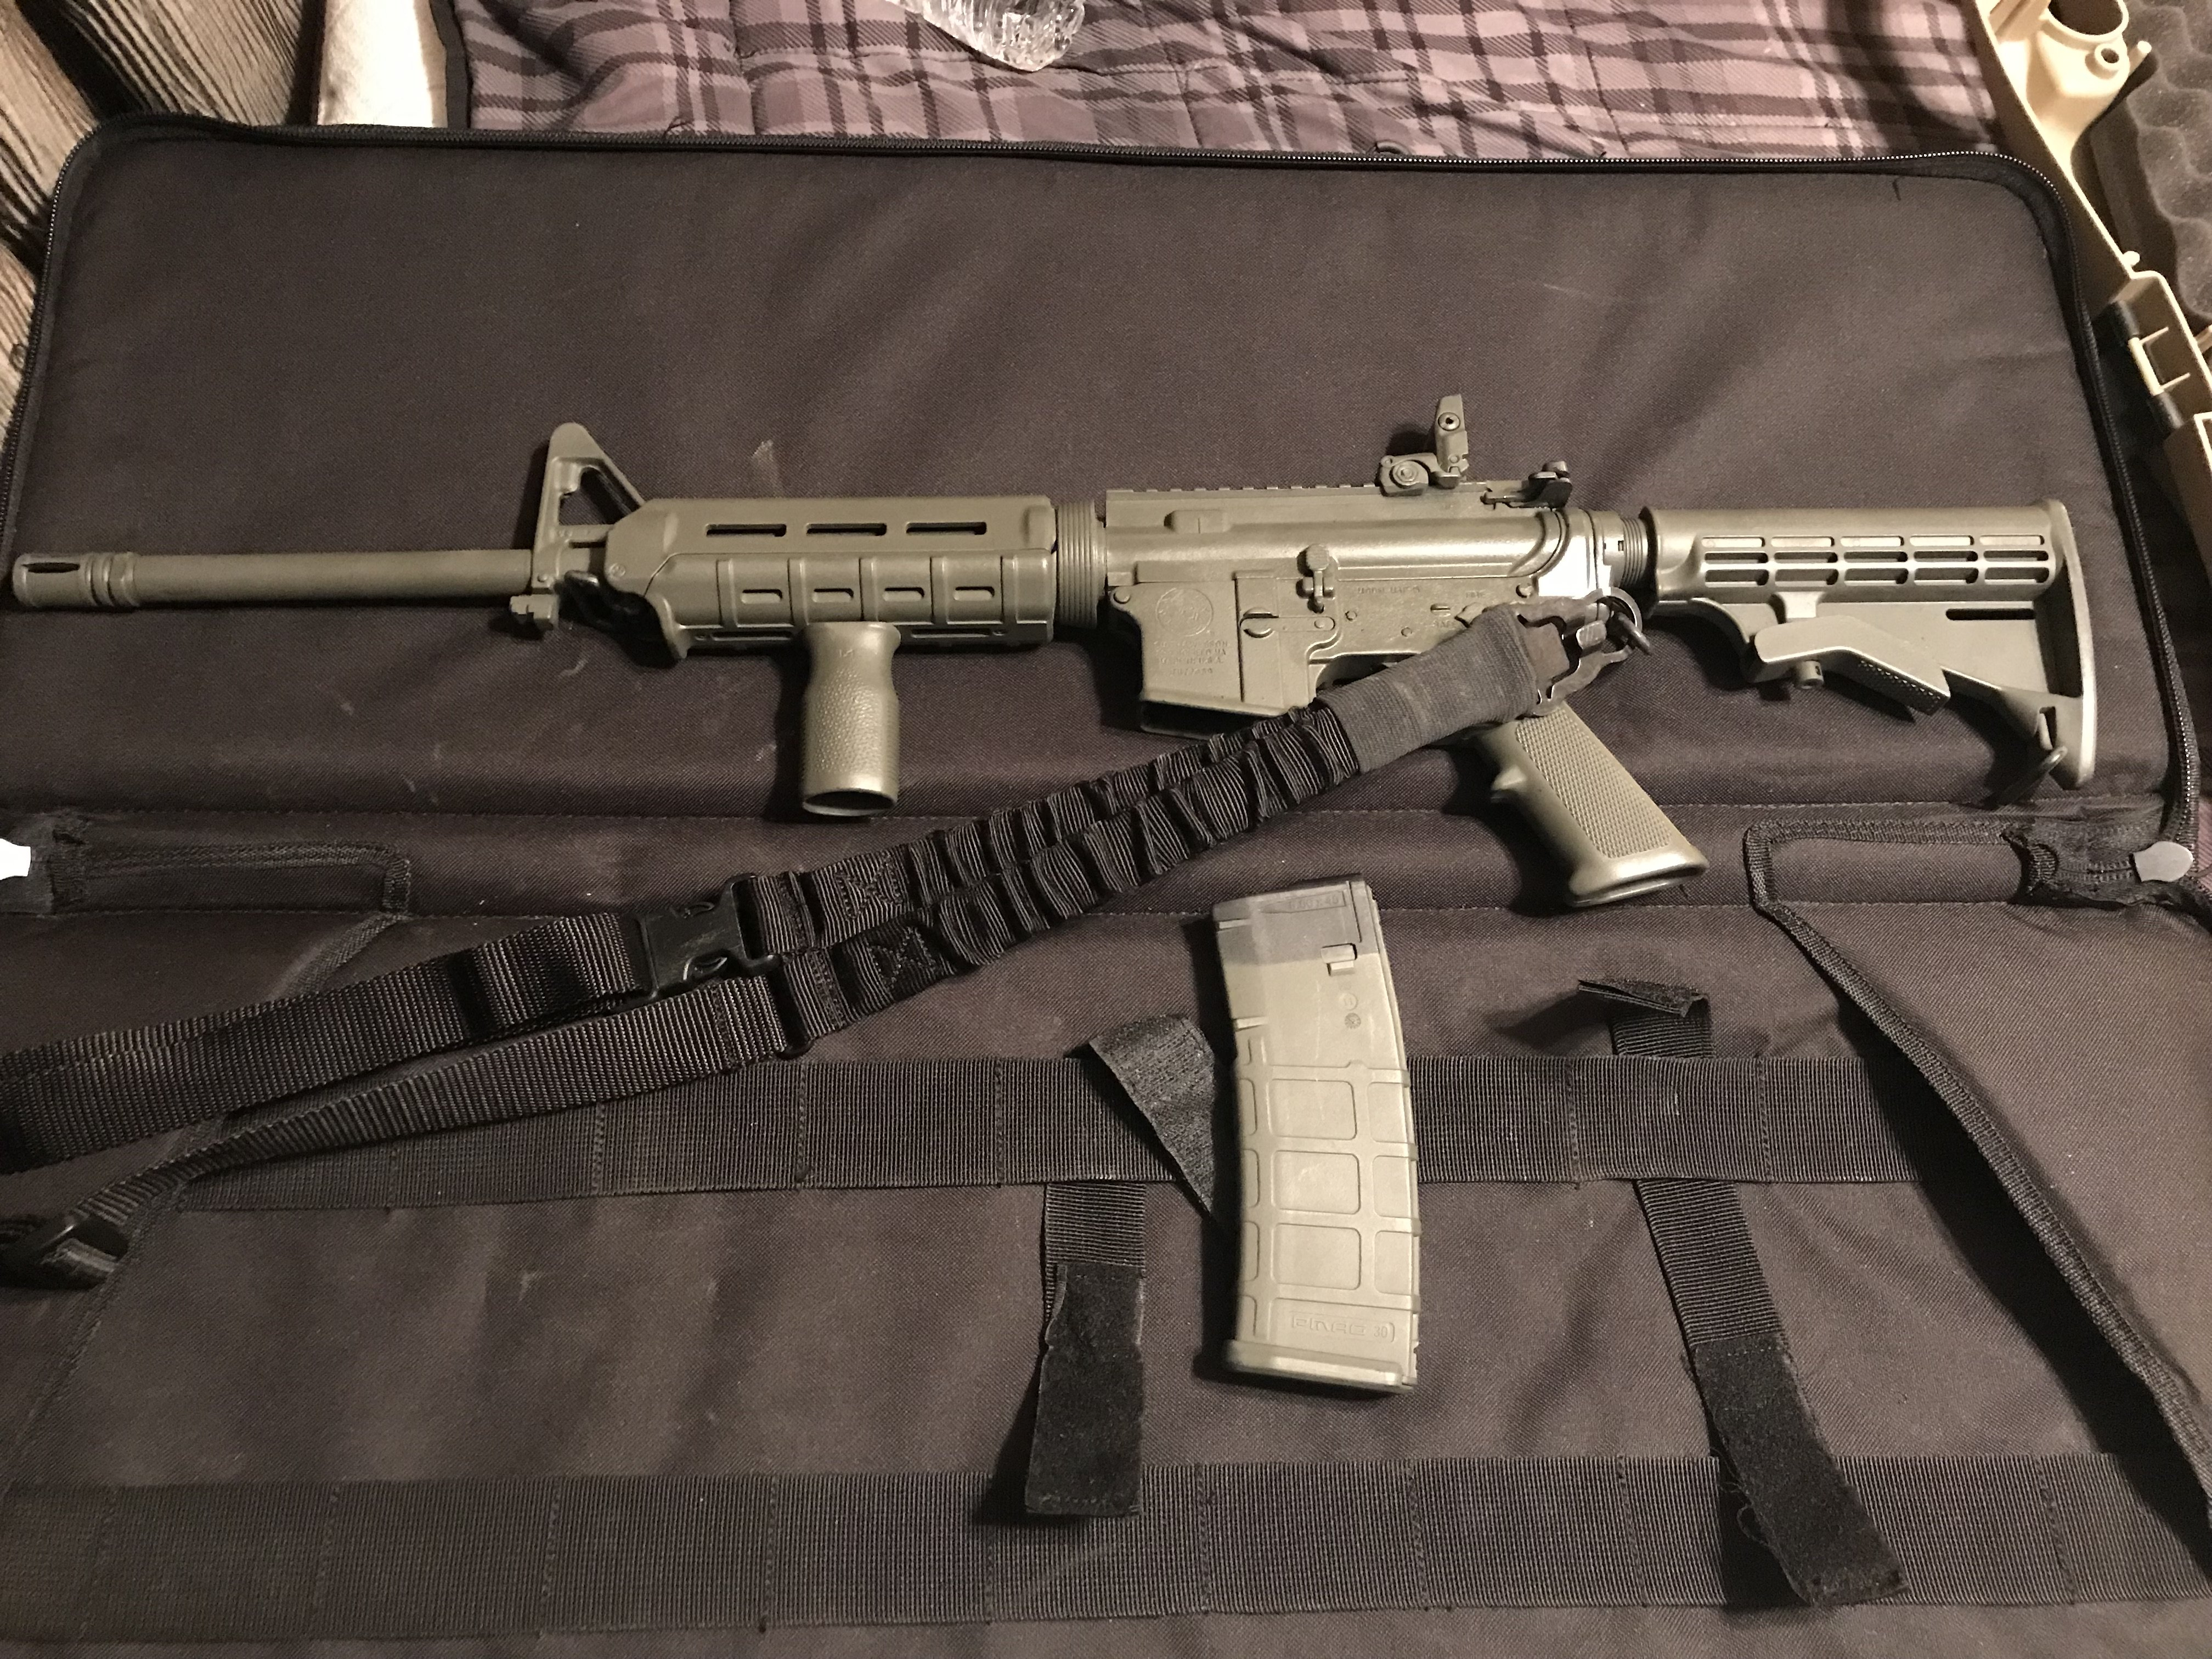 AR-15, Alexander Arms, Remington-img_2672.jpeg